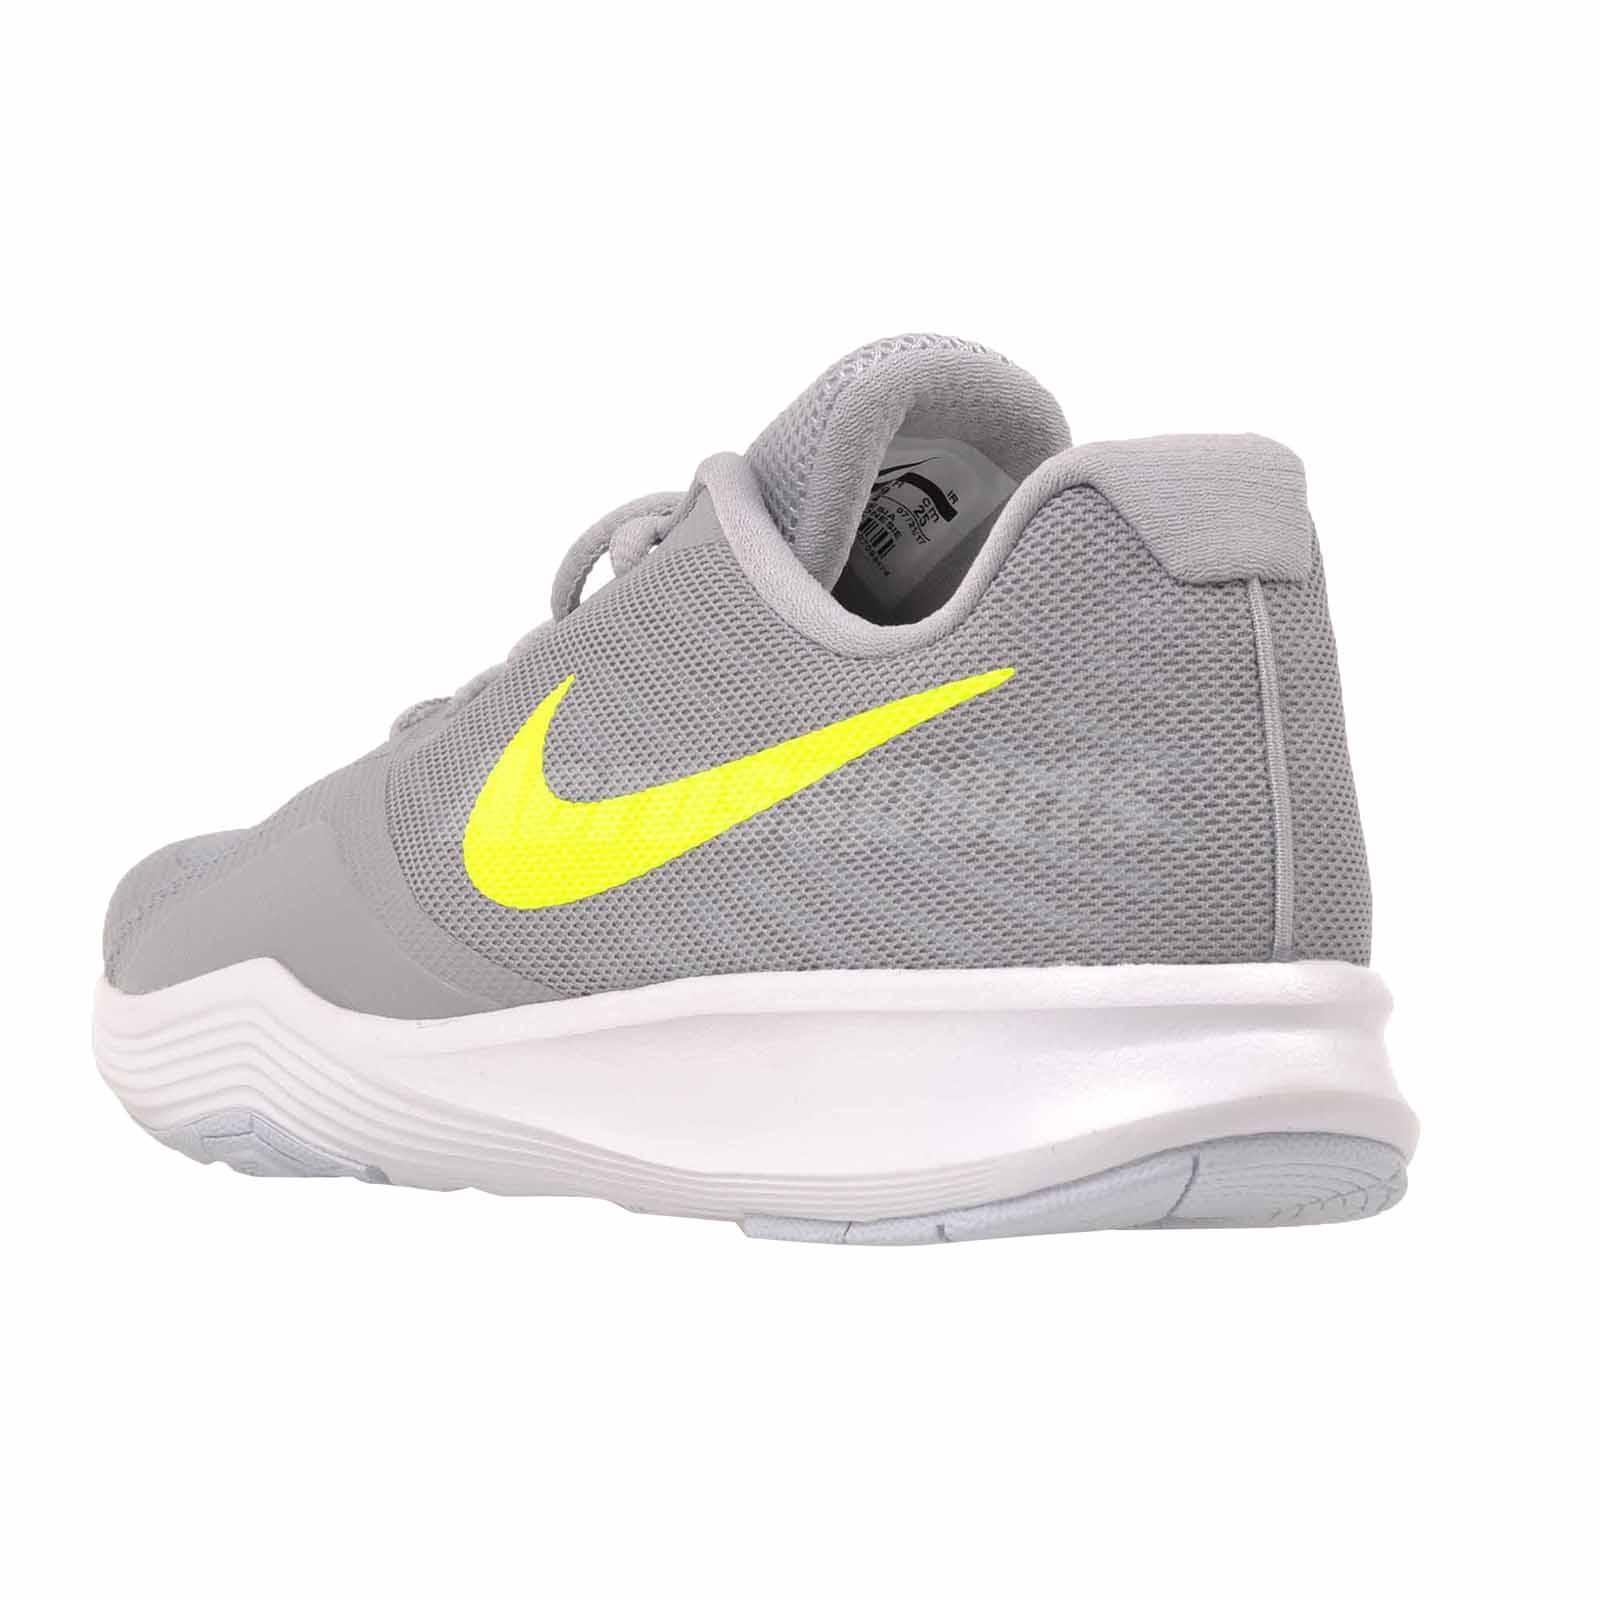 104fc99a2c56ab Nike Wmns City Trainer Cross Training Womens Shoes Grey Volt NWOB ...